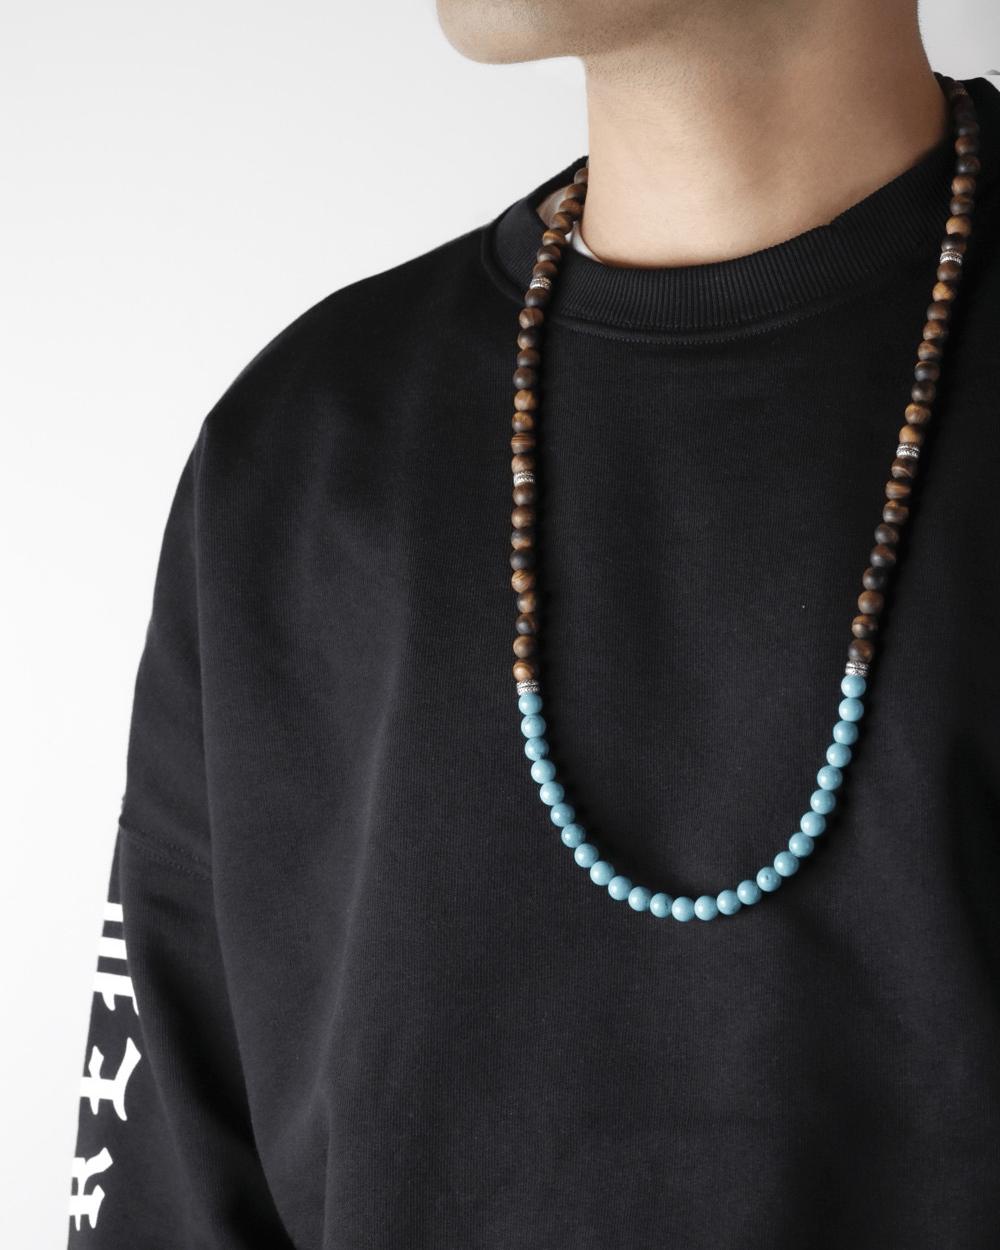 Necklaces BIG OCHRE & TURQUOISE STONES NECKLACE NOVE25